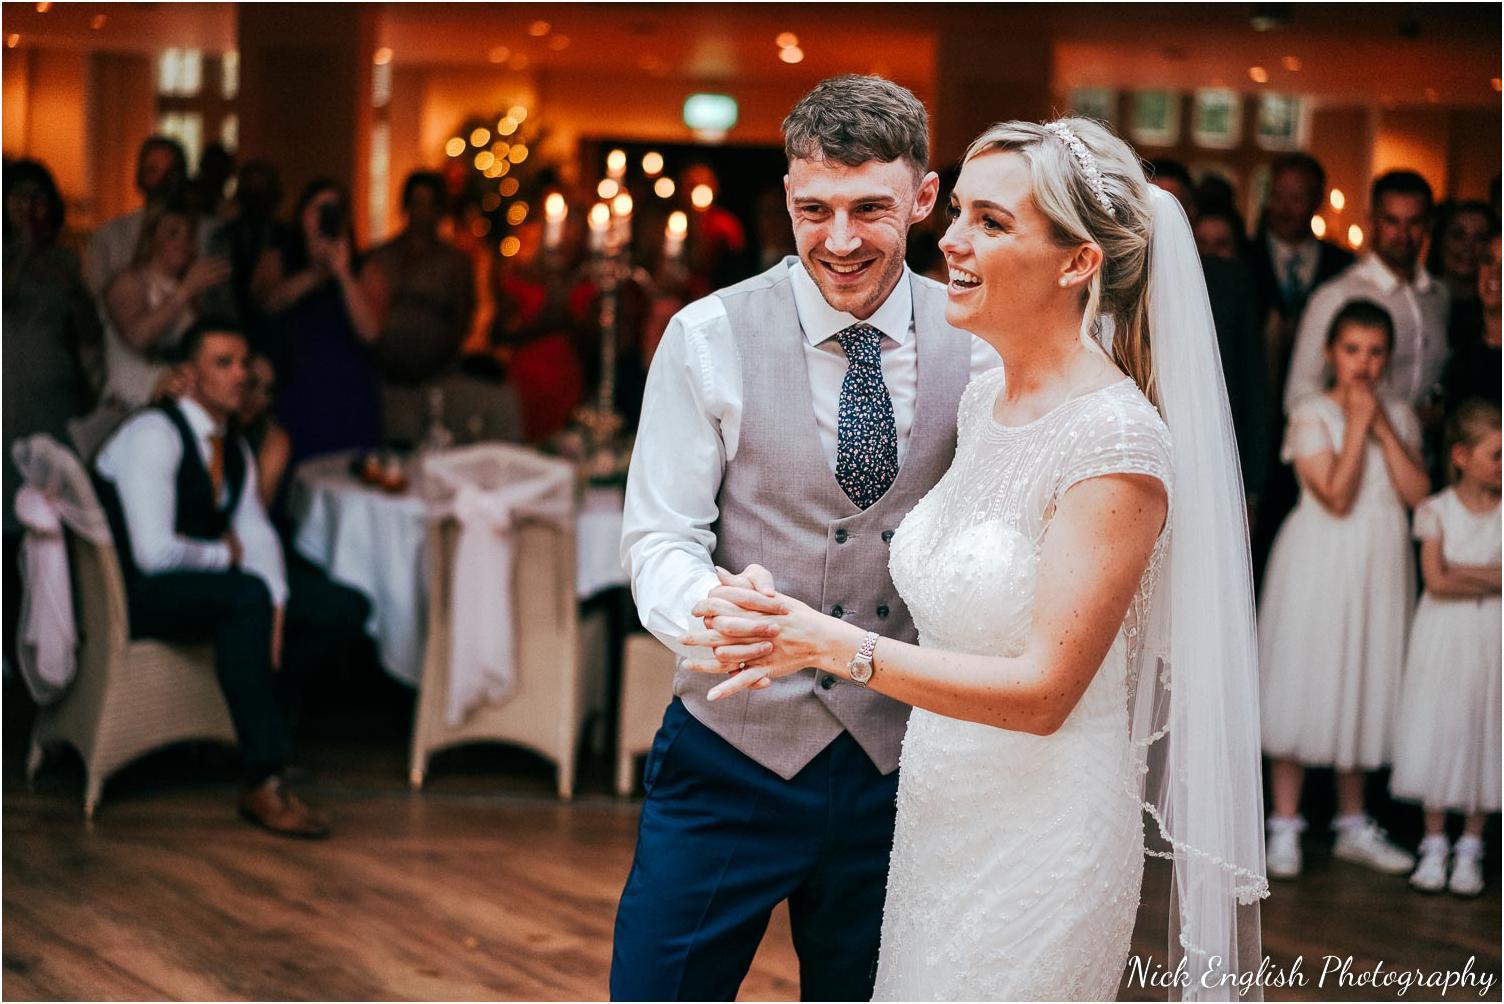 Mitton_Hall_Wedding_Photograph-186.jpg